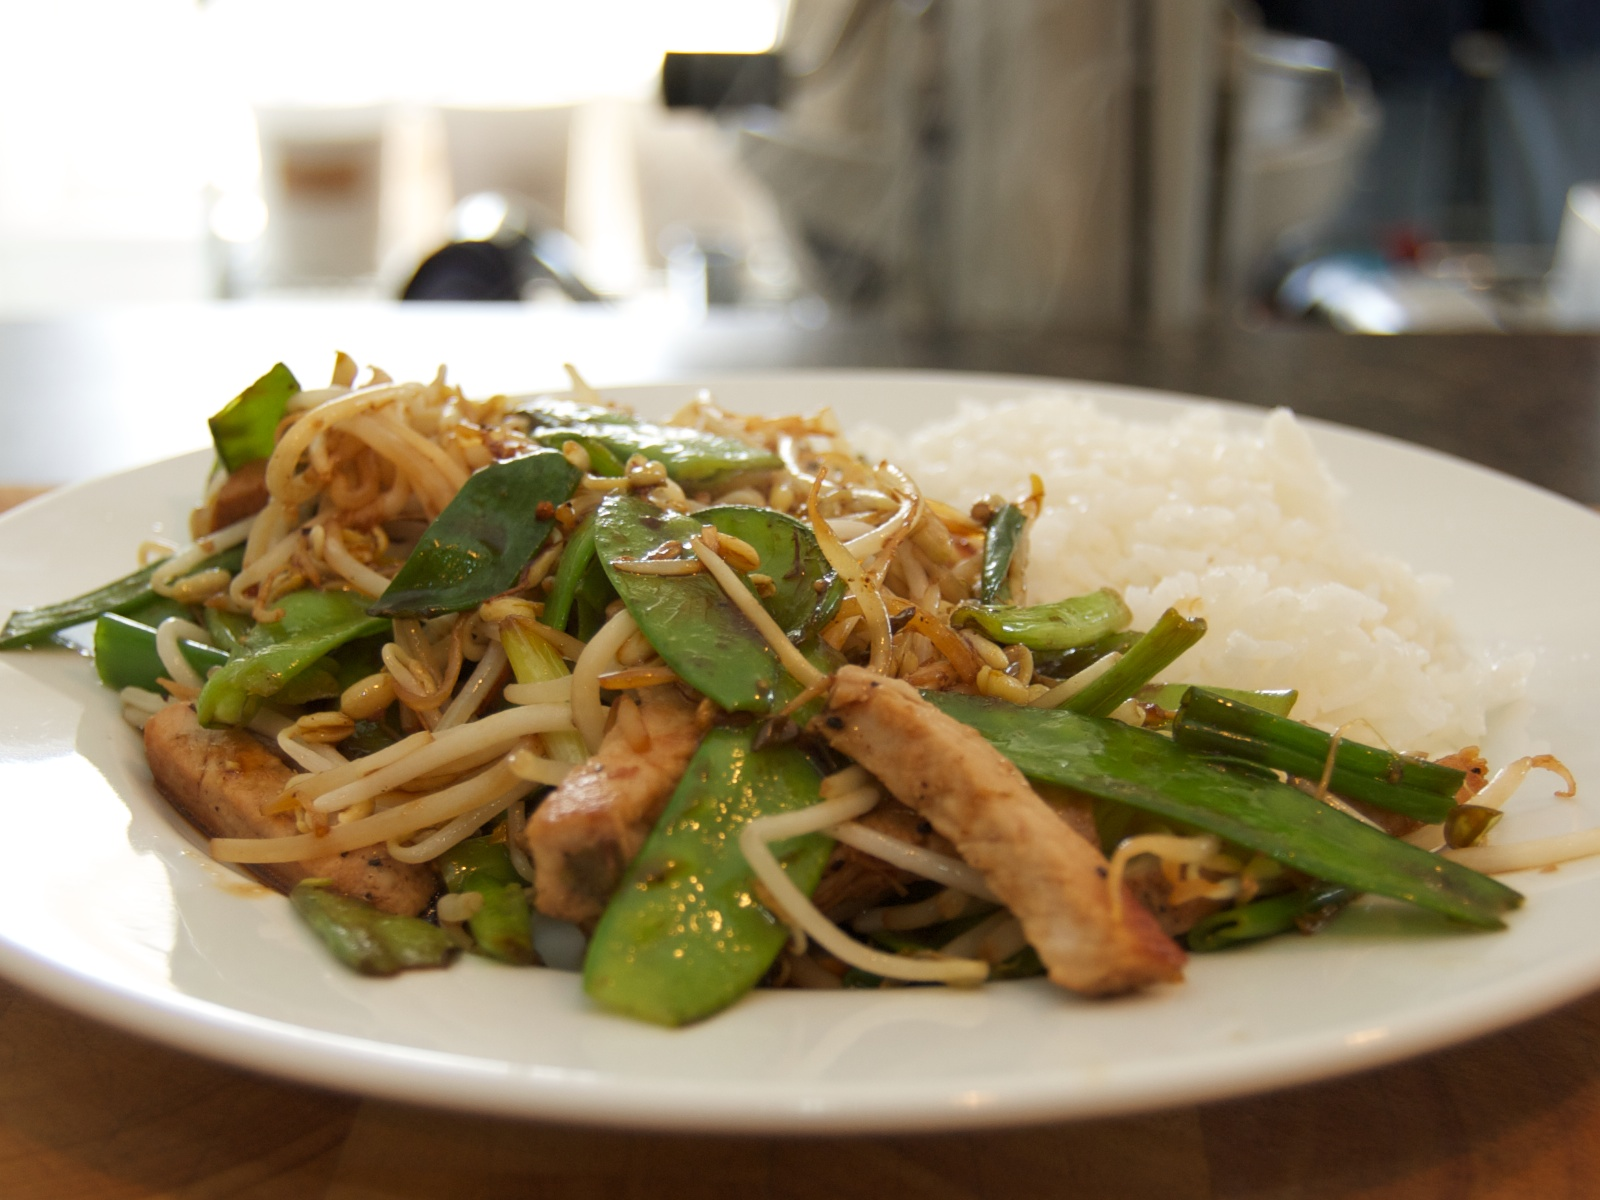 http://blog.rickk.com/food/2011/04/28/ate.2011.04.28.d.jpg